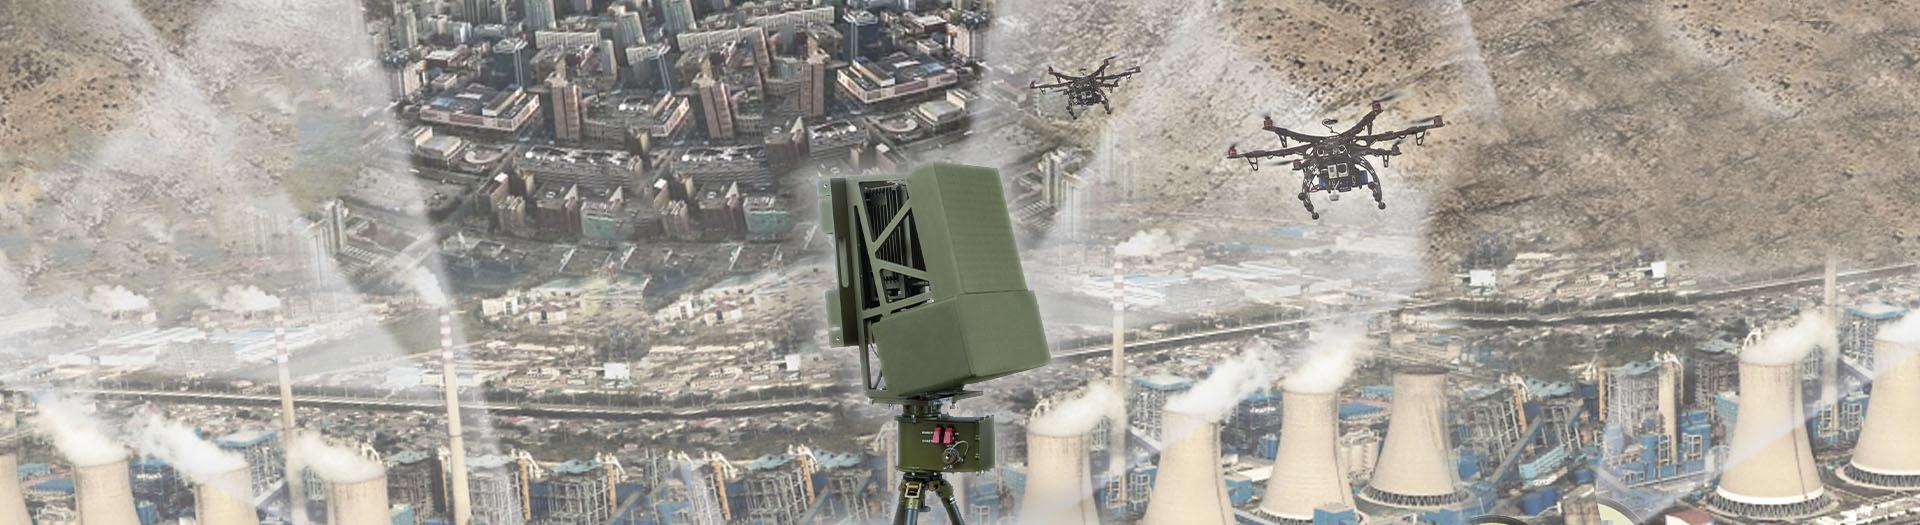 ELK-7009: Compact Directional C-UAV Jammer   IAI   ELTA Systems